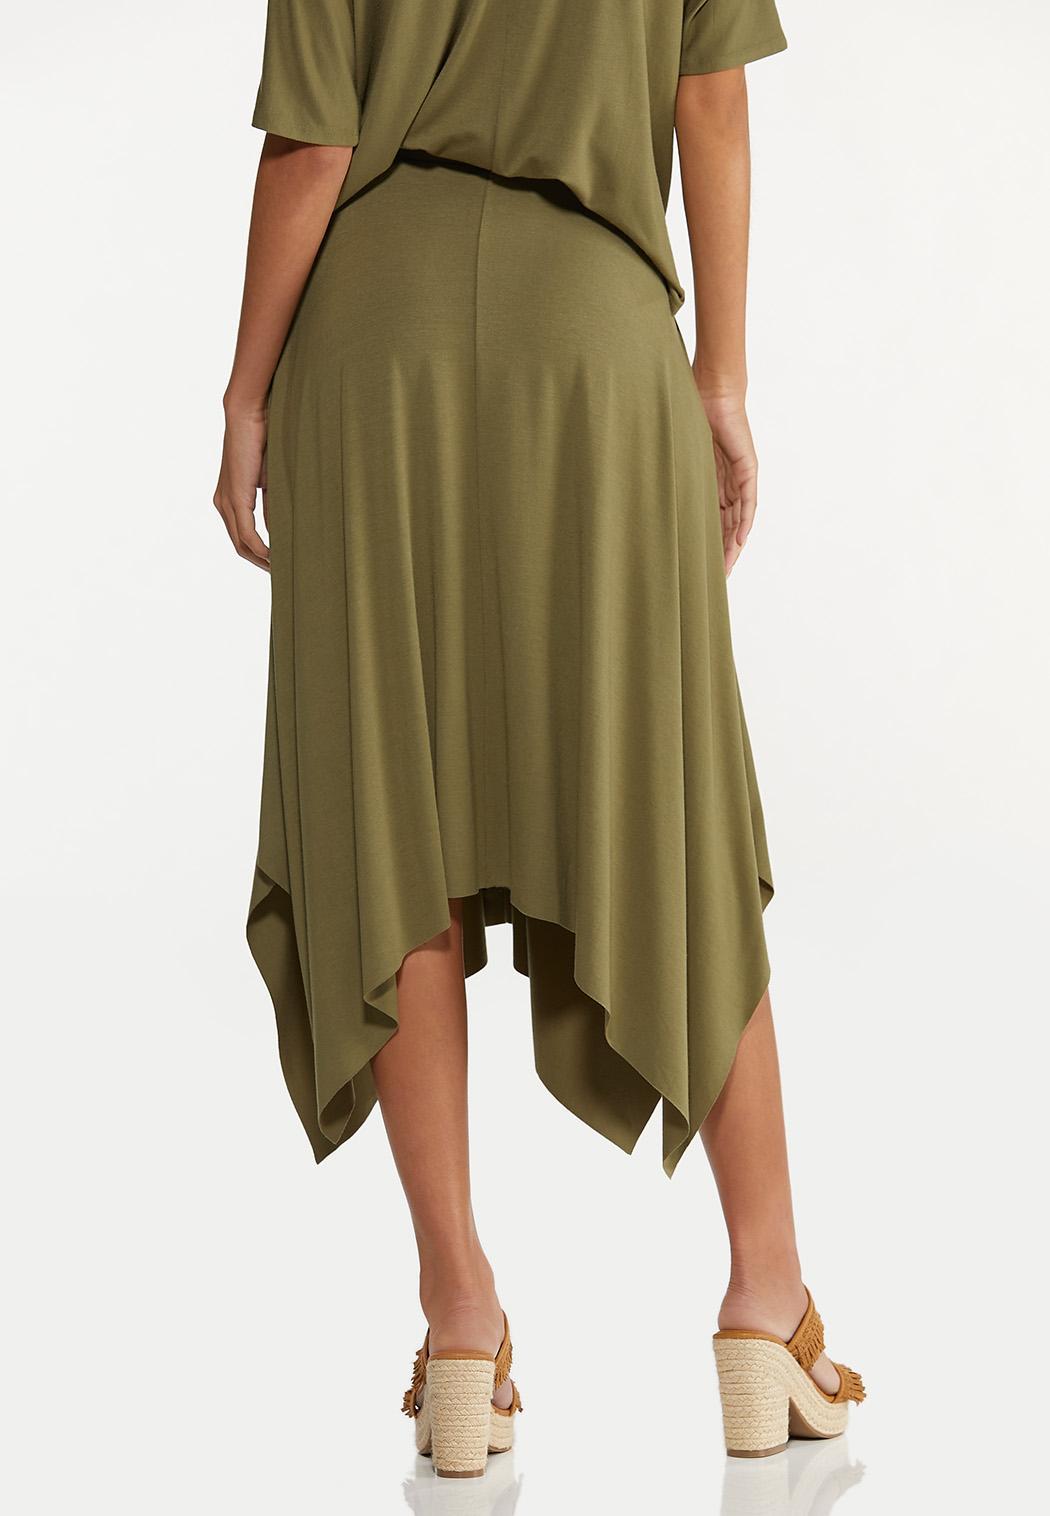 Olive Hanky Hem Skirt (Item #44616505)